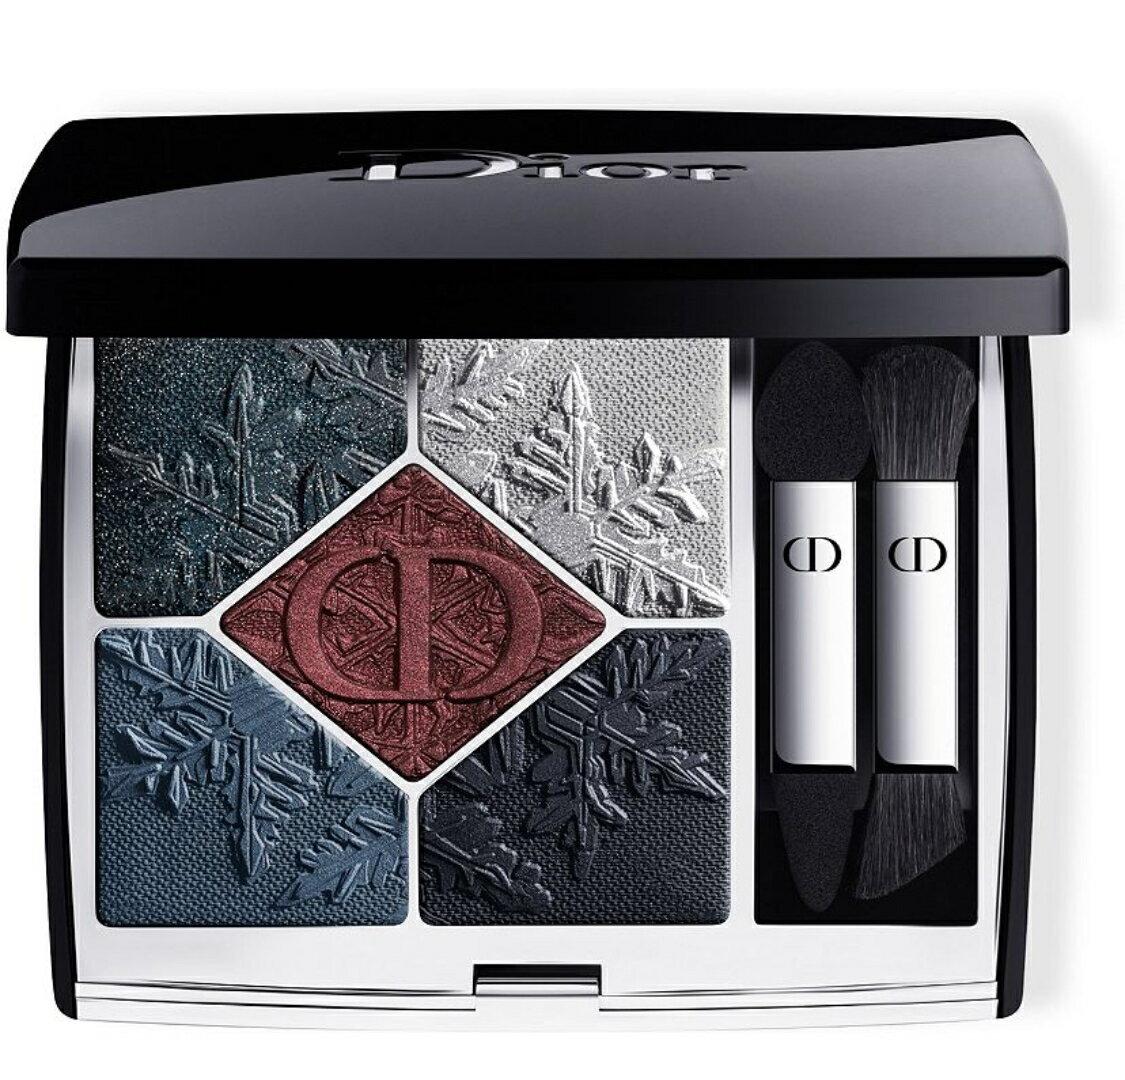 Dior 2020聖誕彩妝 經典五色眼影金燦星夜 限量版眼影盤 549金燦星夜 089繁星之夜《小乖小舖》